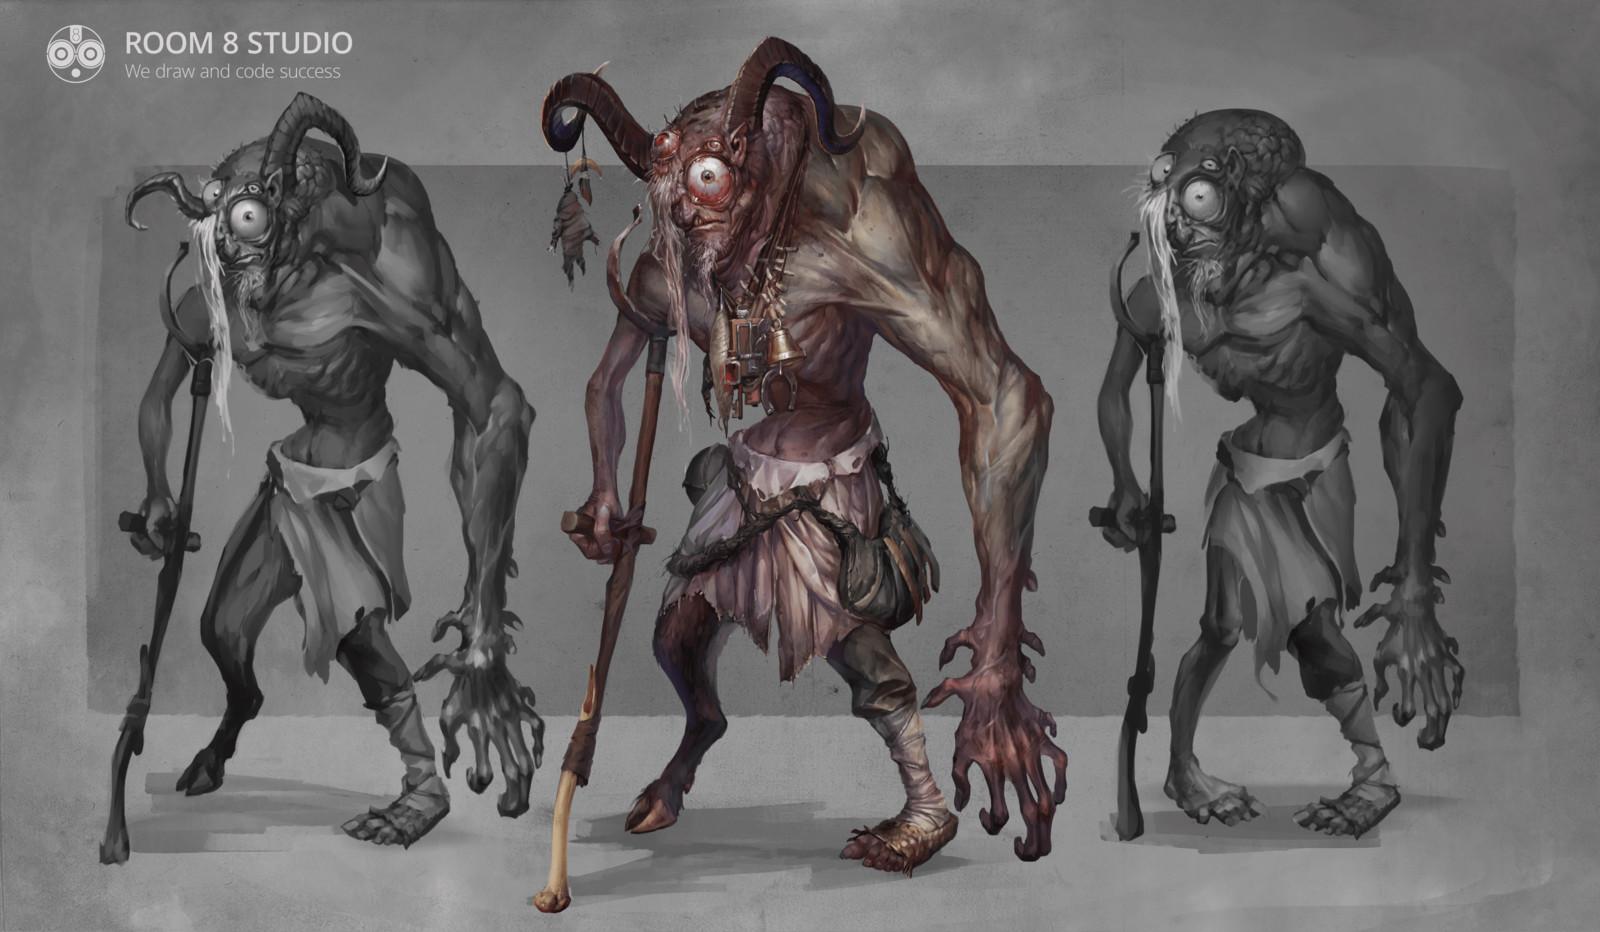 Verlioka: Fantasy Creature from Witcher Universe